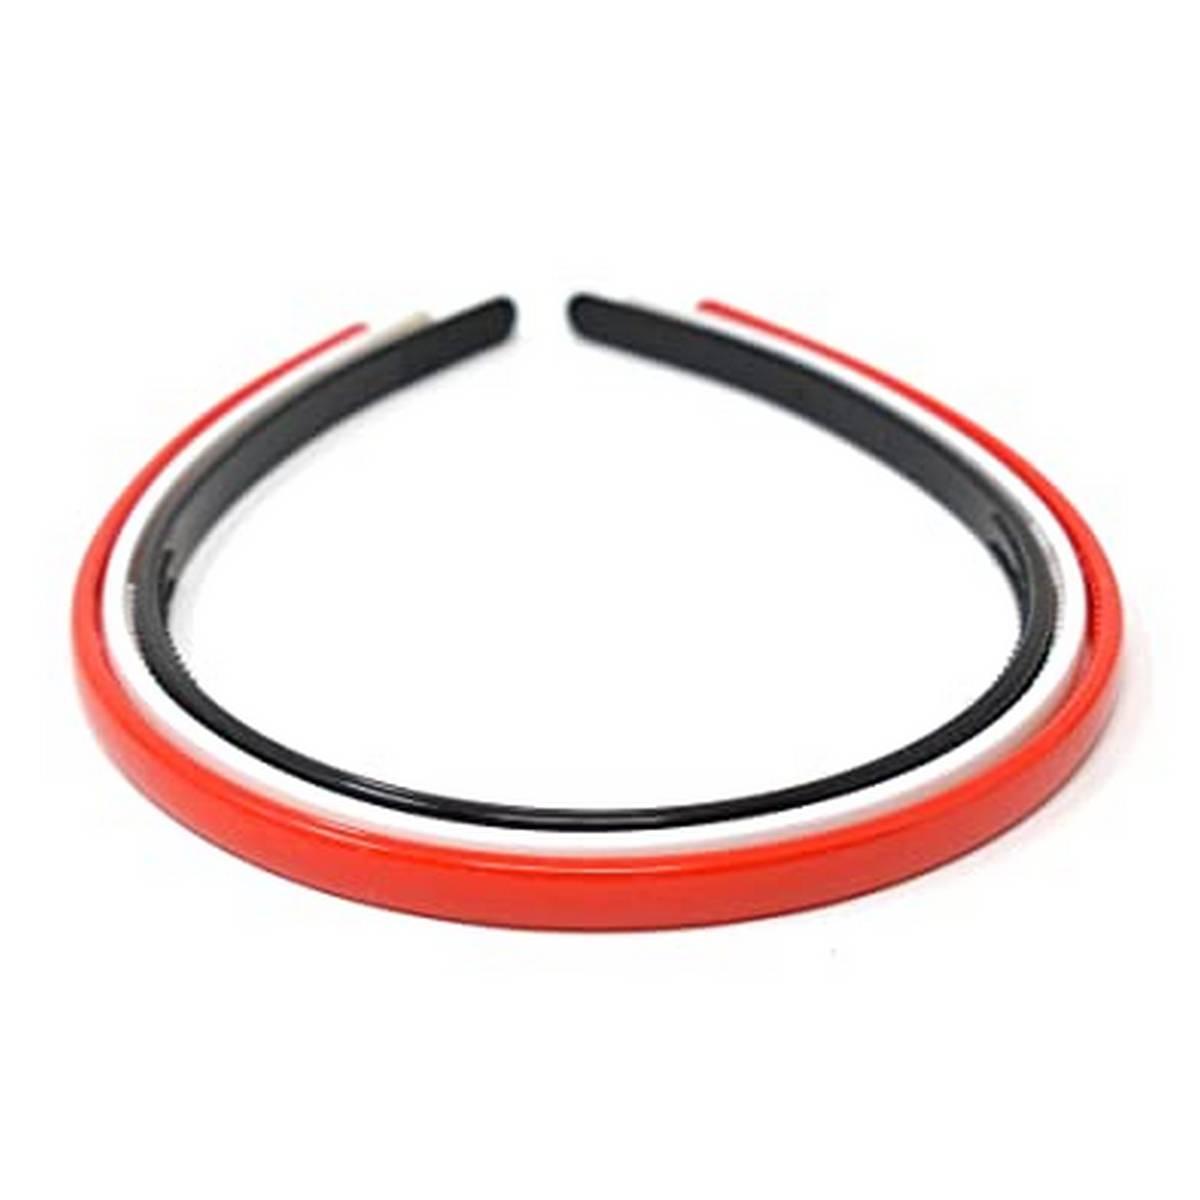 Pack of 3 Red, White, and Black Hairband/Headband for Teen/Kids/Girls - Hair Organizer